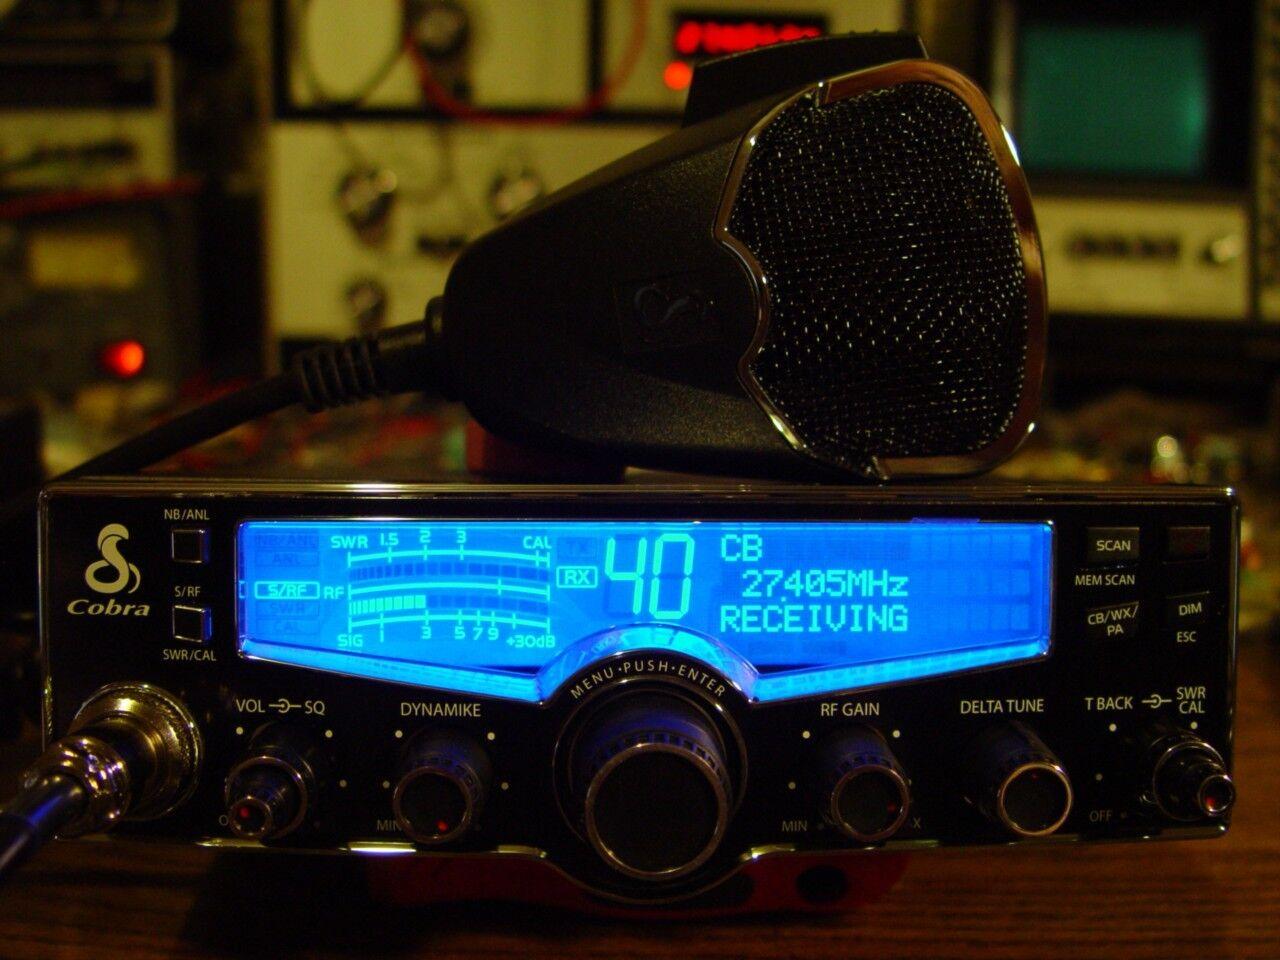 COBRA 29 LX CB RADIO,SUPERTUNED,FINALS WITH HIGH REC KIT INS